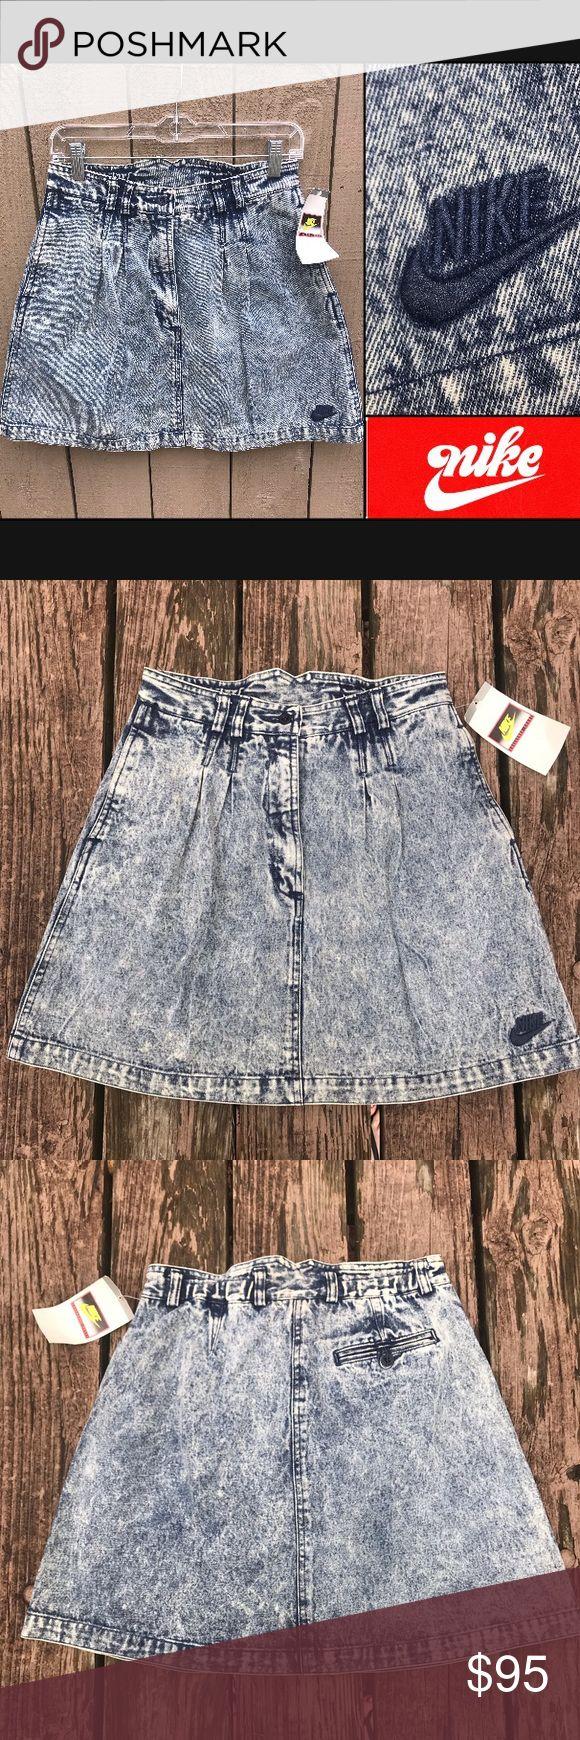 ✔️ Vintage Nike High Waist Agassi Acid Wash Skirt •Brand: Nike •Style: V…